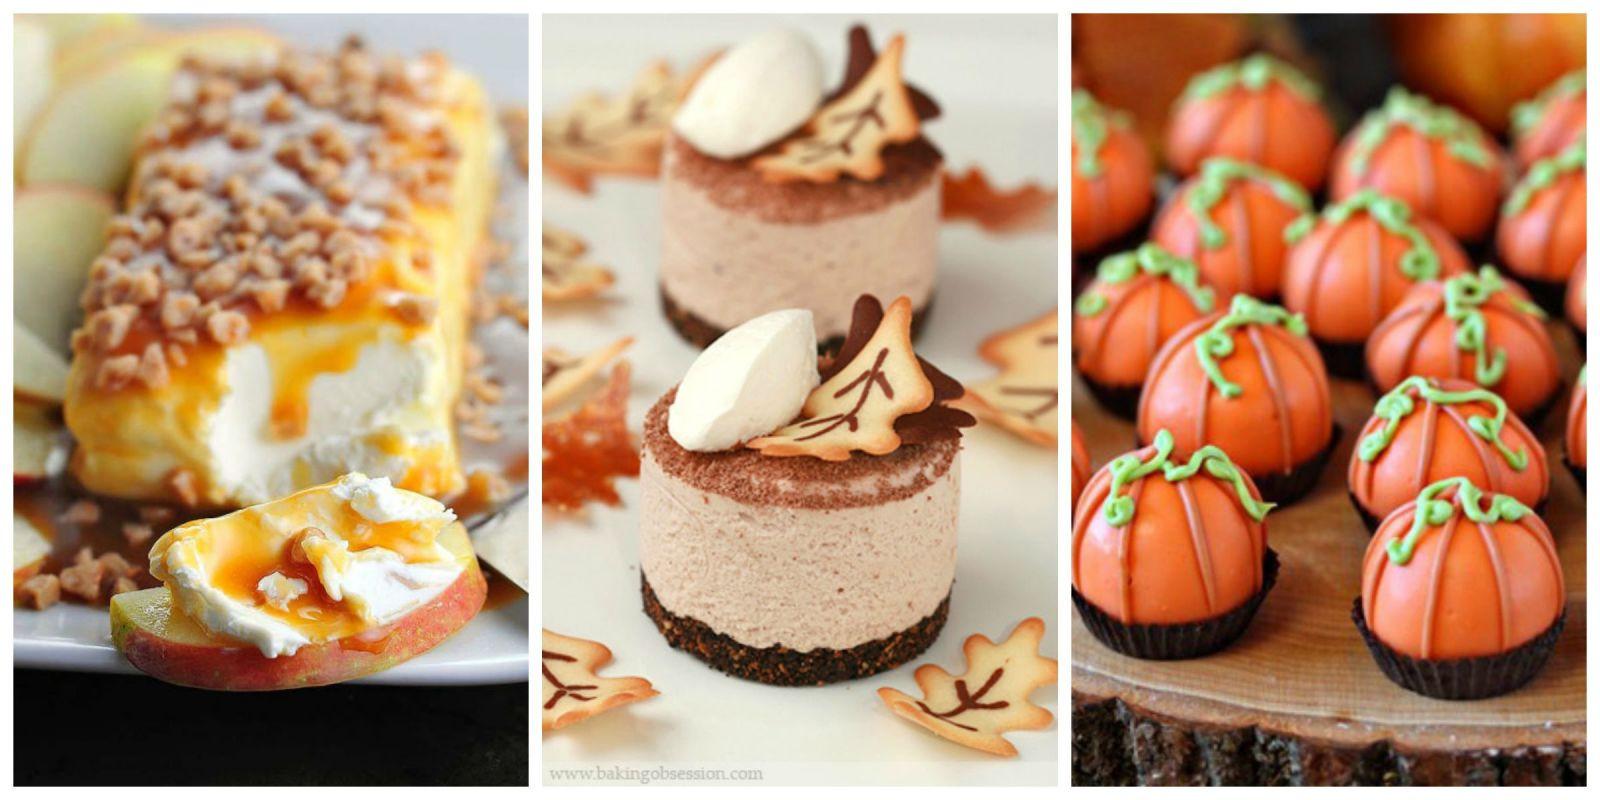 Fun Fall Desserts  35 Easy Fall Dessert Recipes Best Treats for Autumn Parties